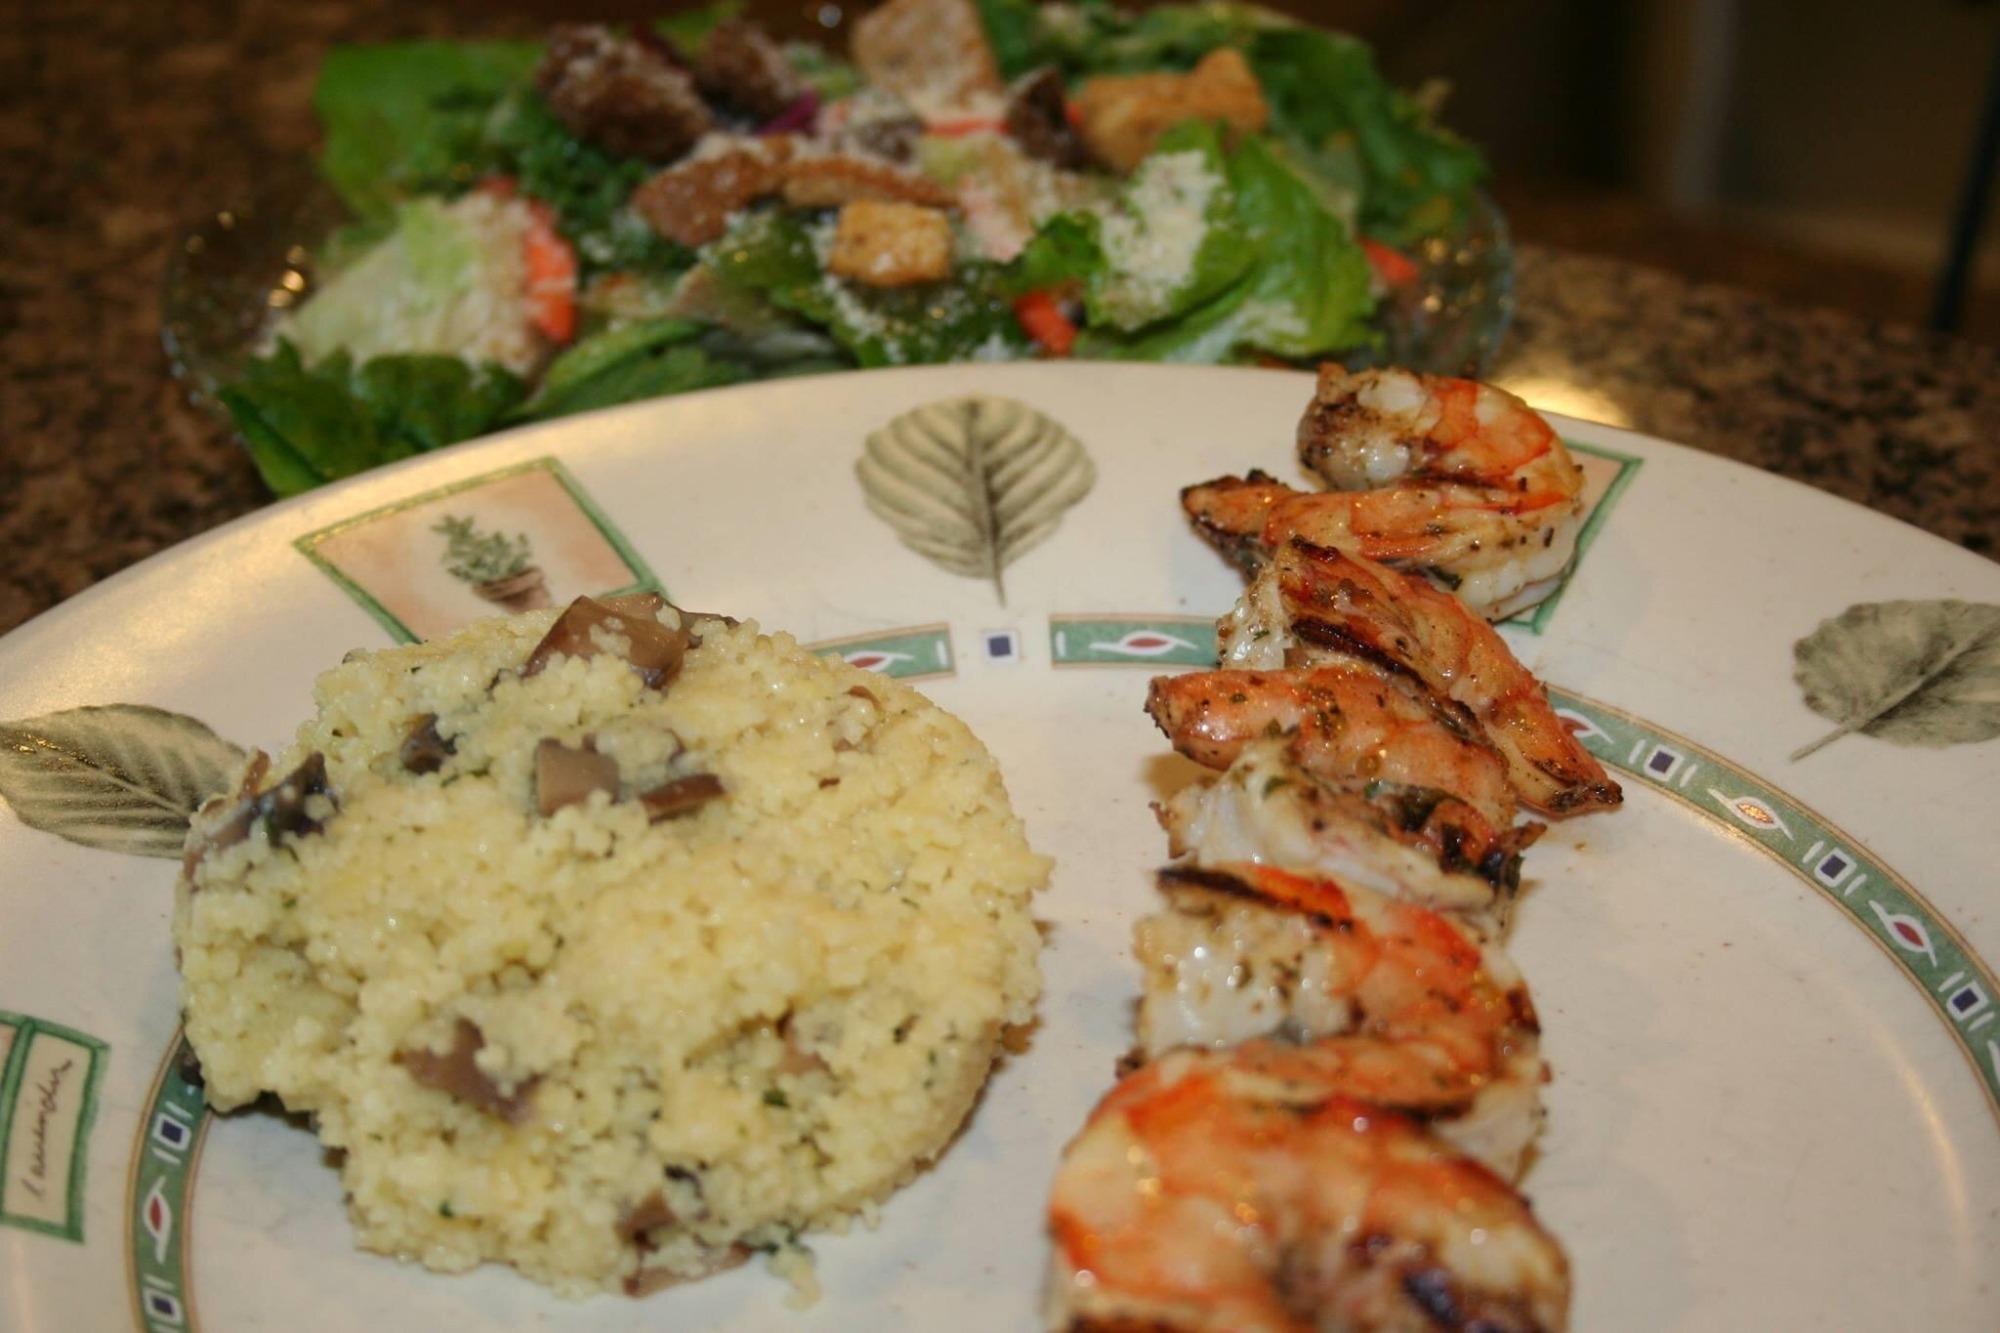 seafood recipe 3 image 5